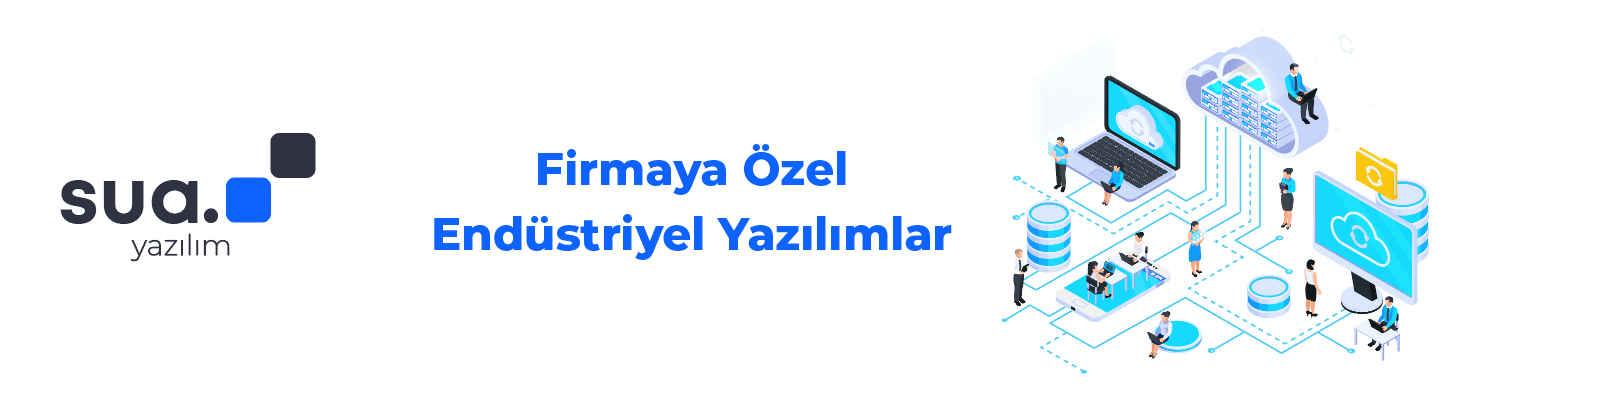 Sua Yazilim banner fotograf